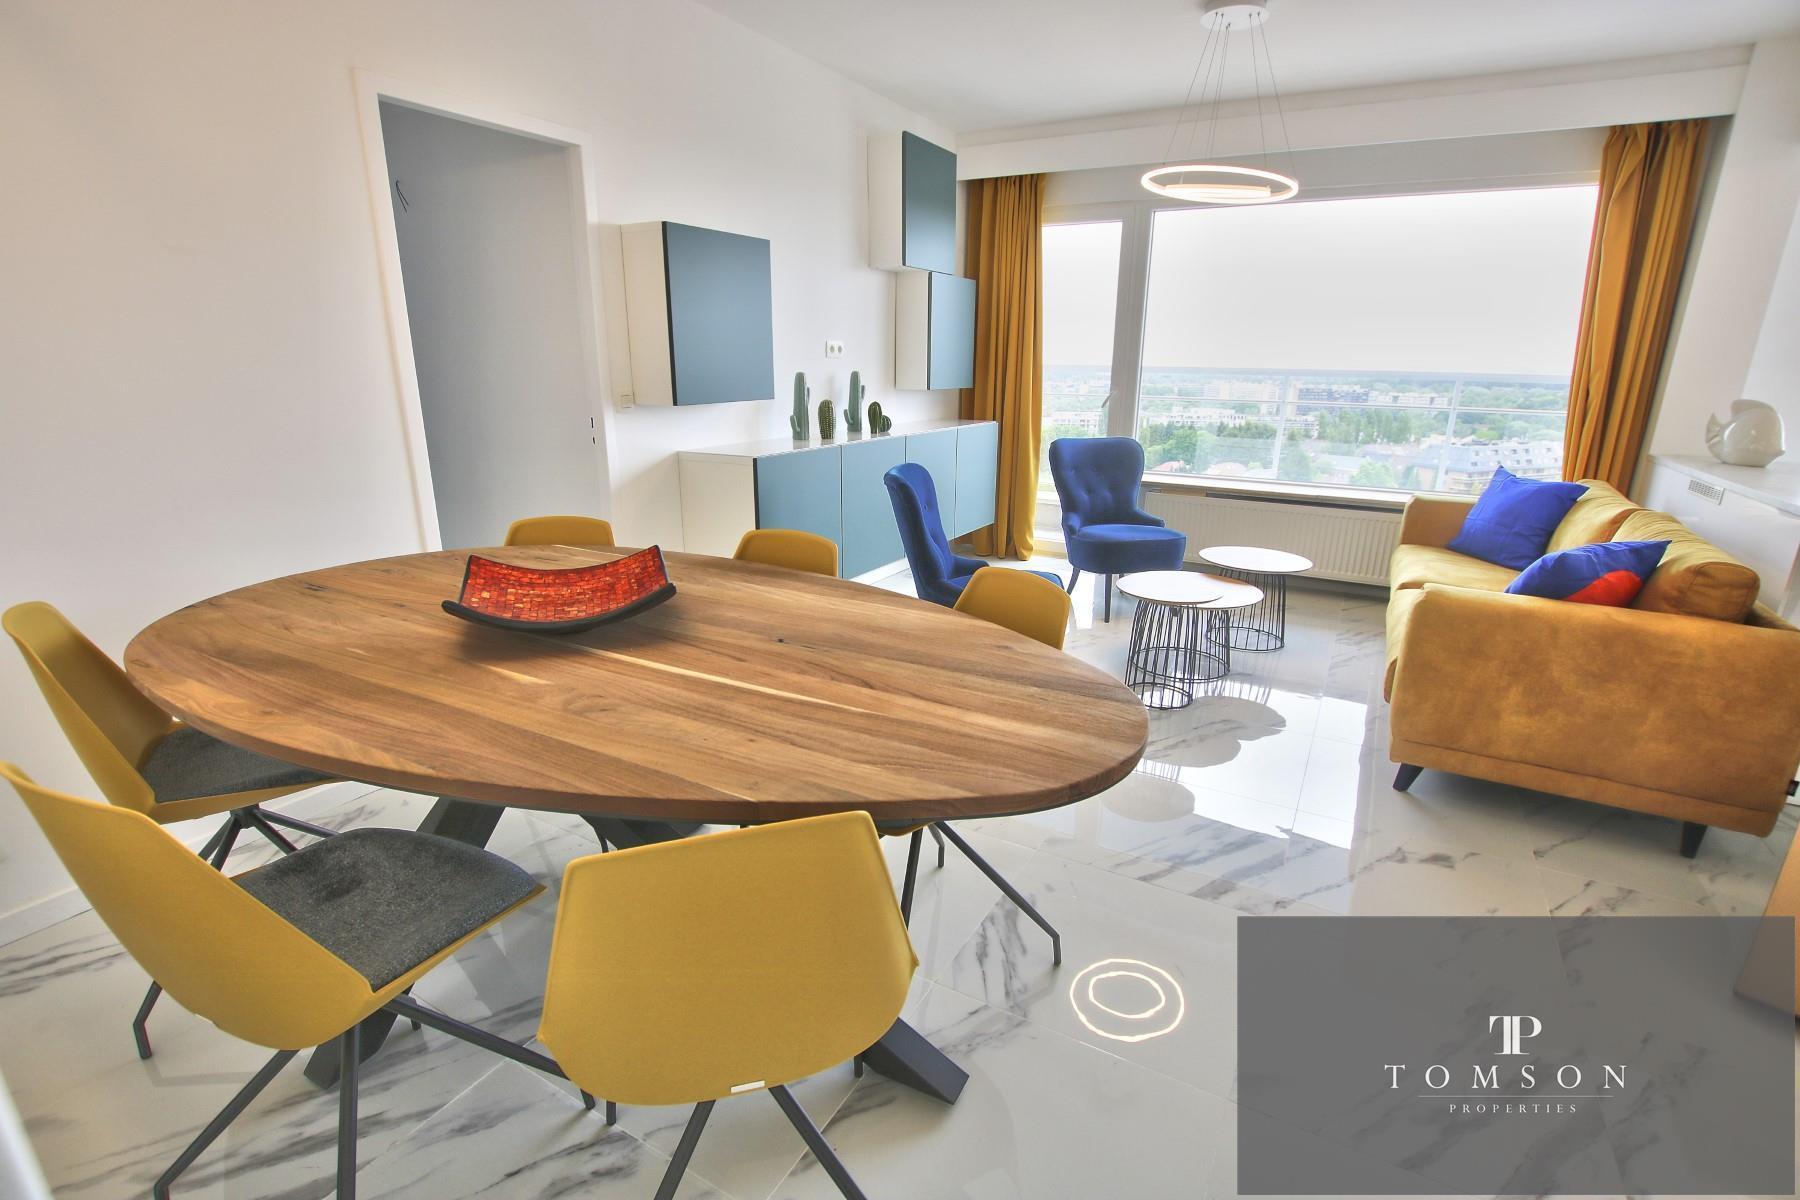 Appartement - Woluwe-Saint-Lambert - #4530512-1